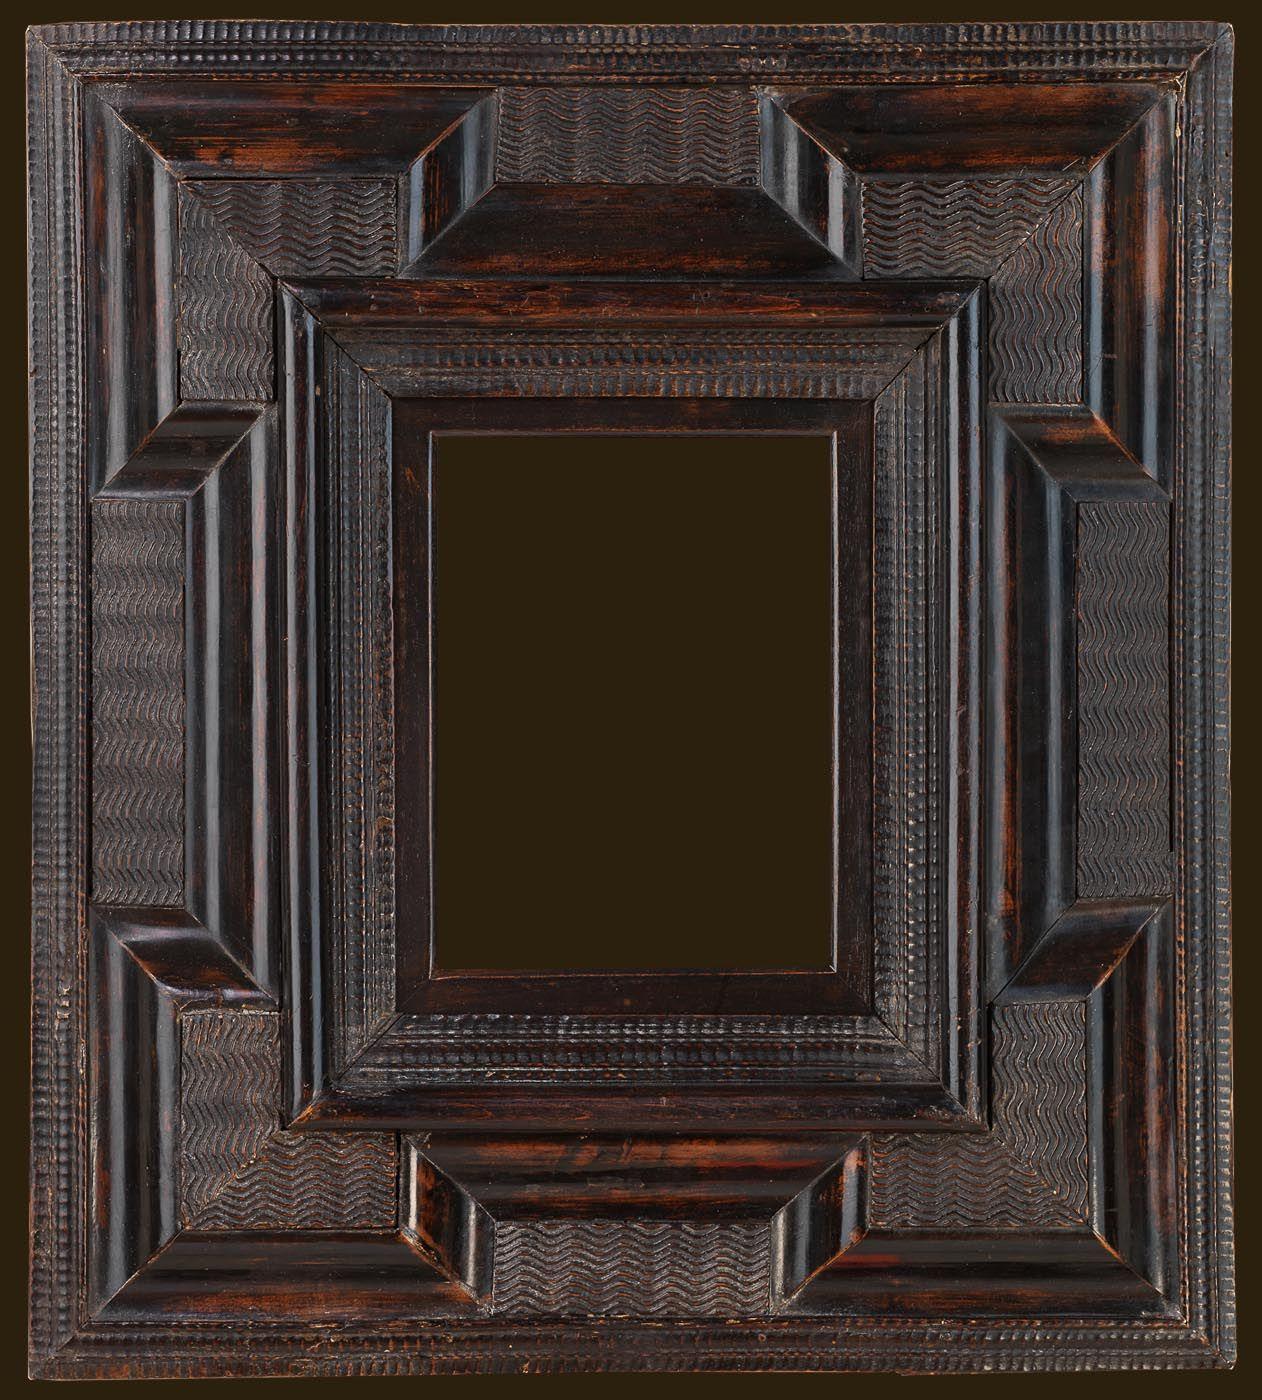 Dutch 17th Century, 9 1/4″ x 7 1/8″ x 5 1/4″ diegosalazar.com ...